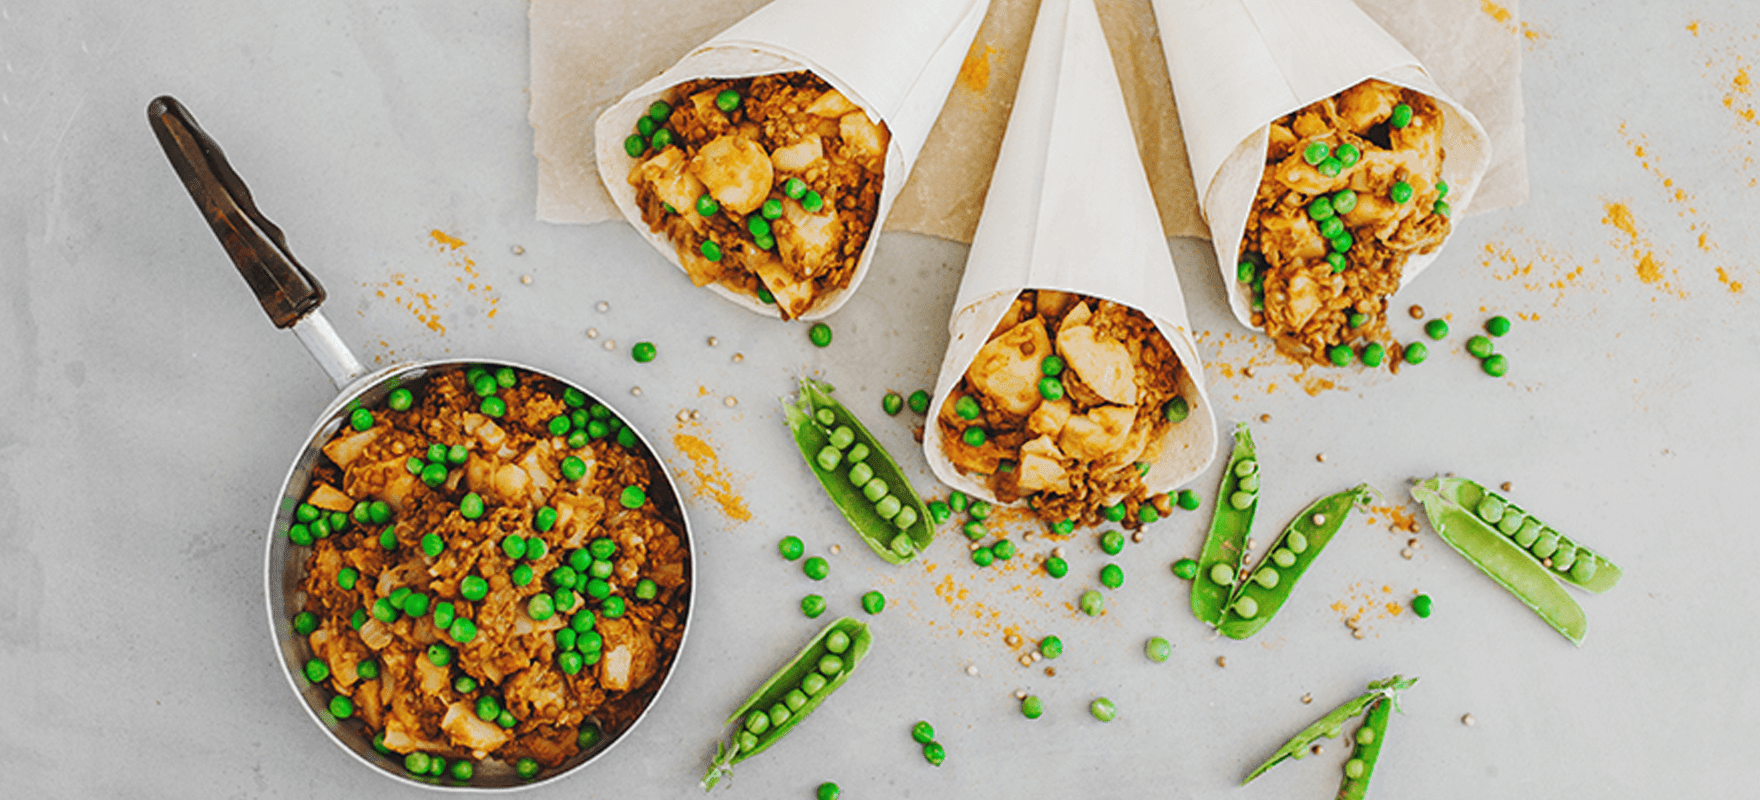 Potato and pea curry in roti cones image 1